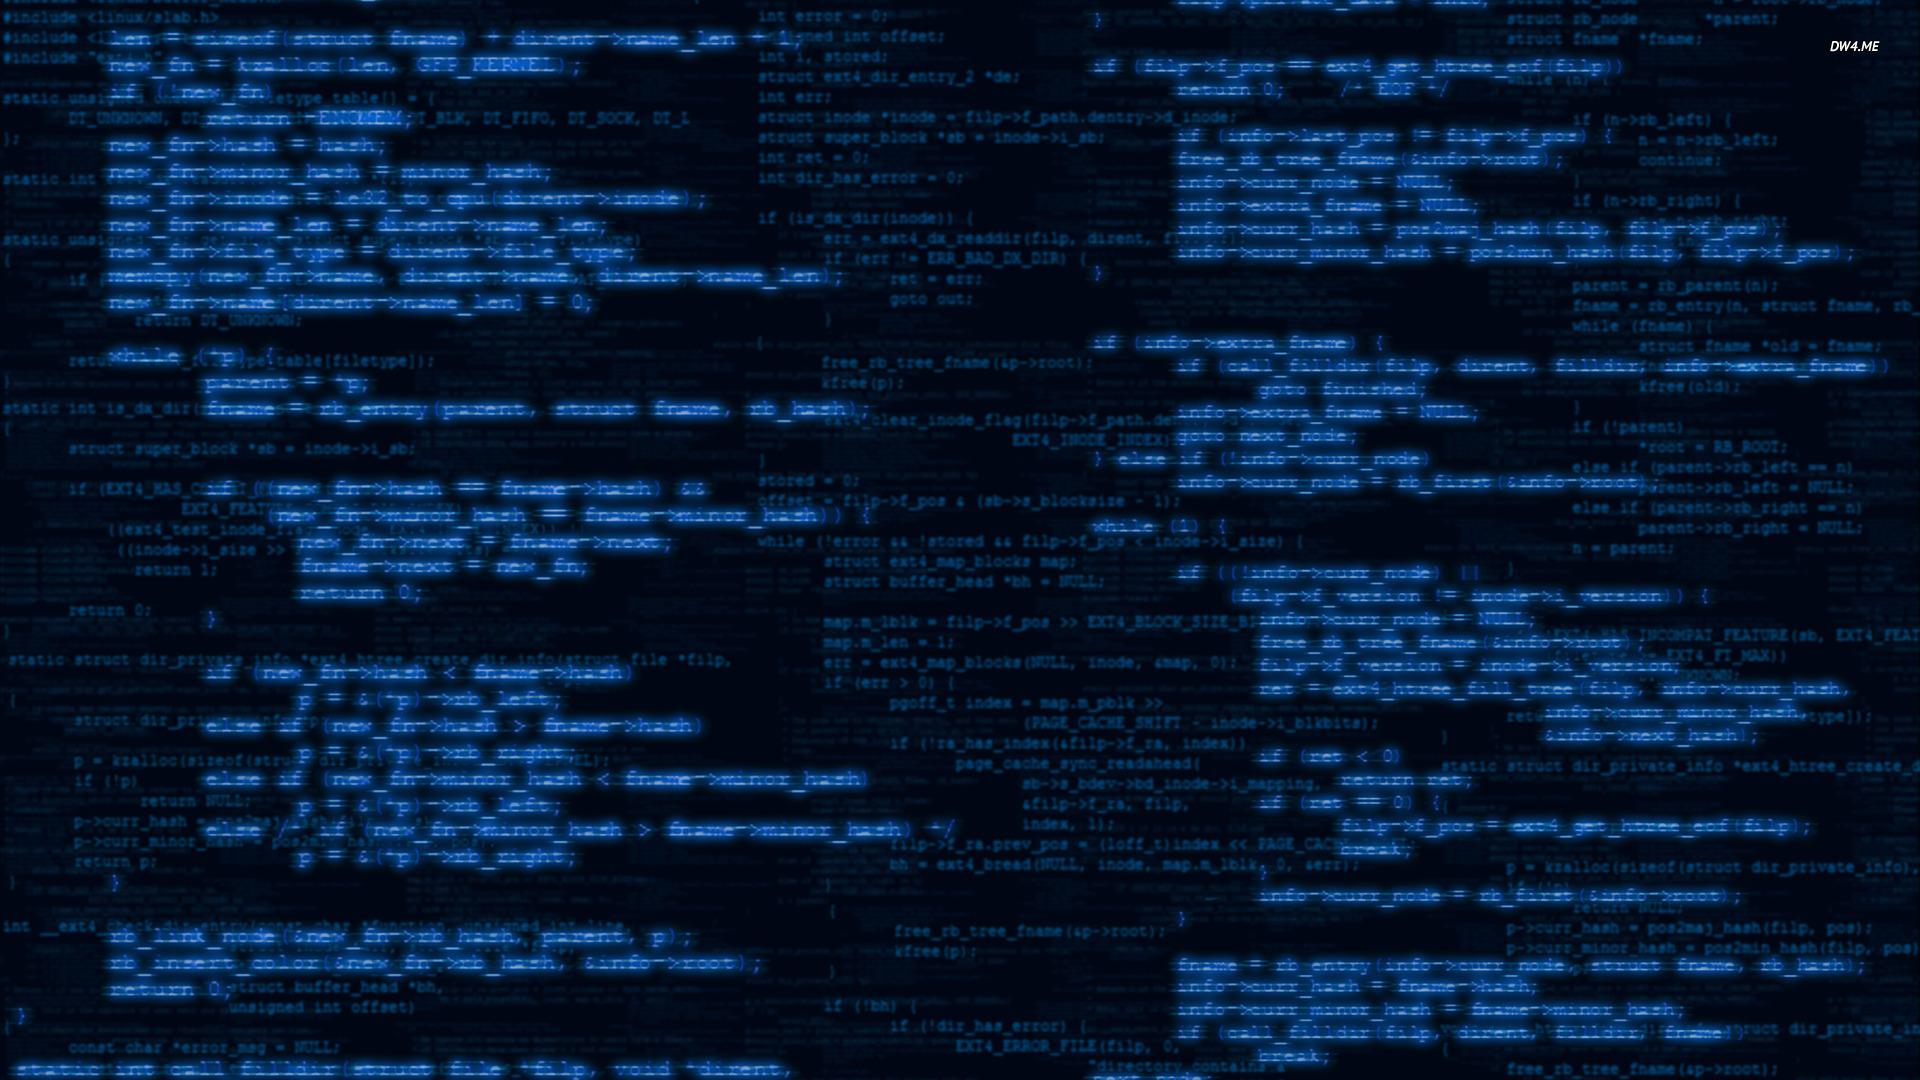 Source code wallpaper   Digital Art wallpapers   774 1920x1080